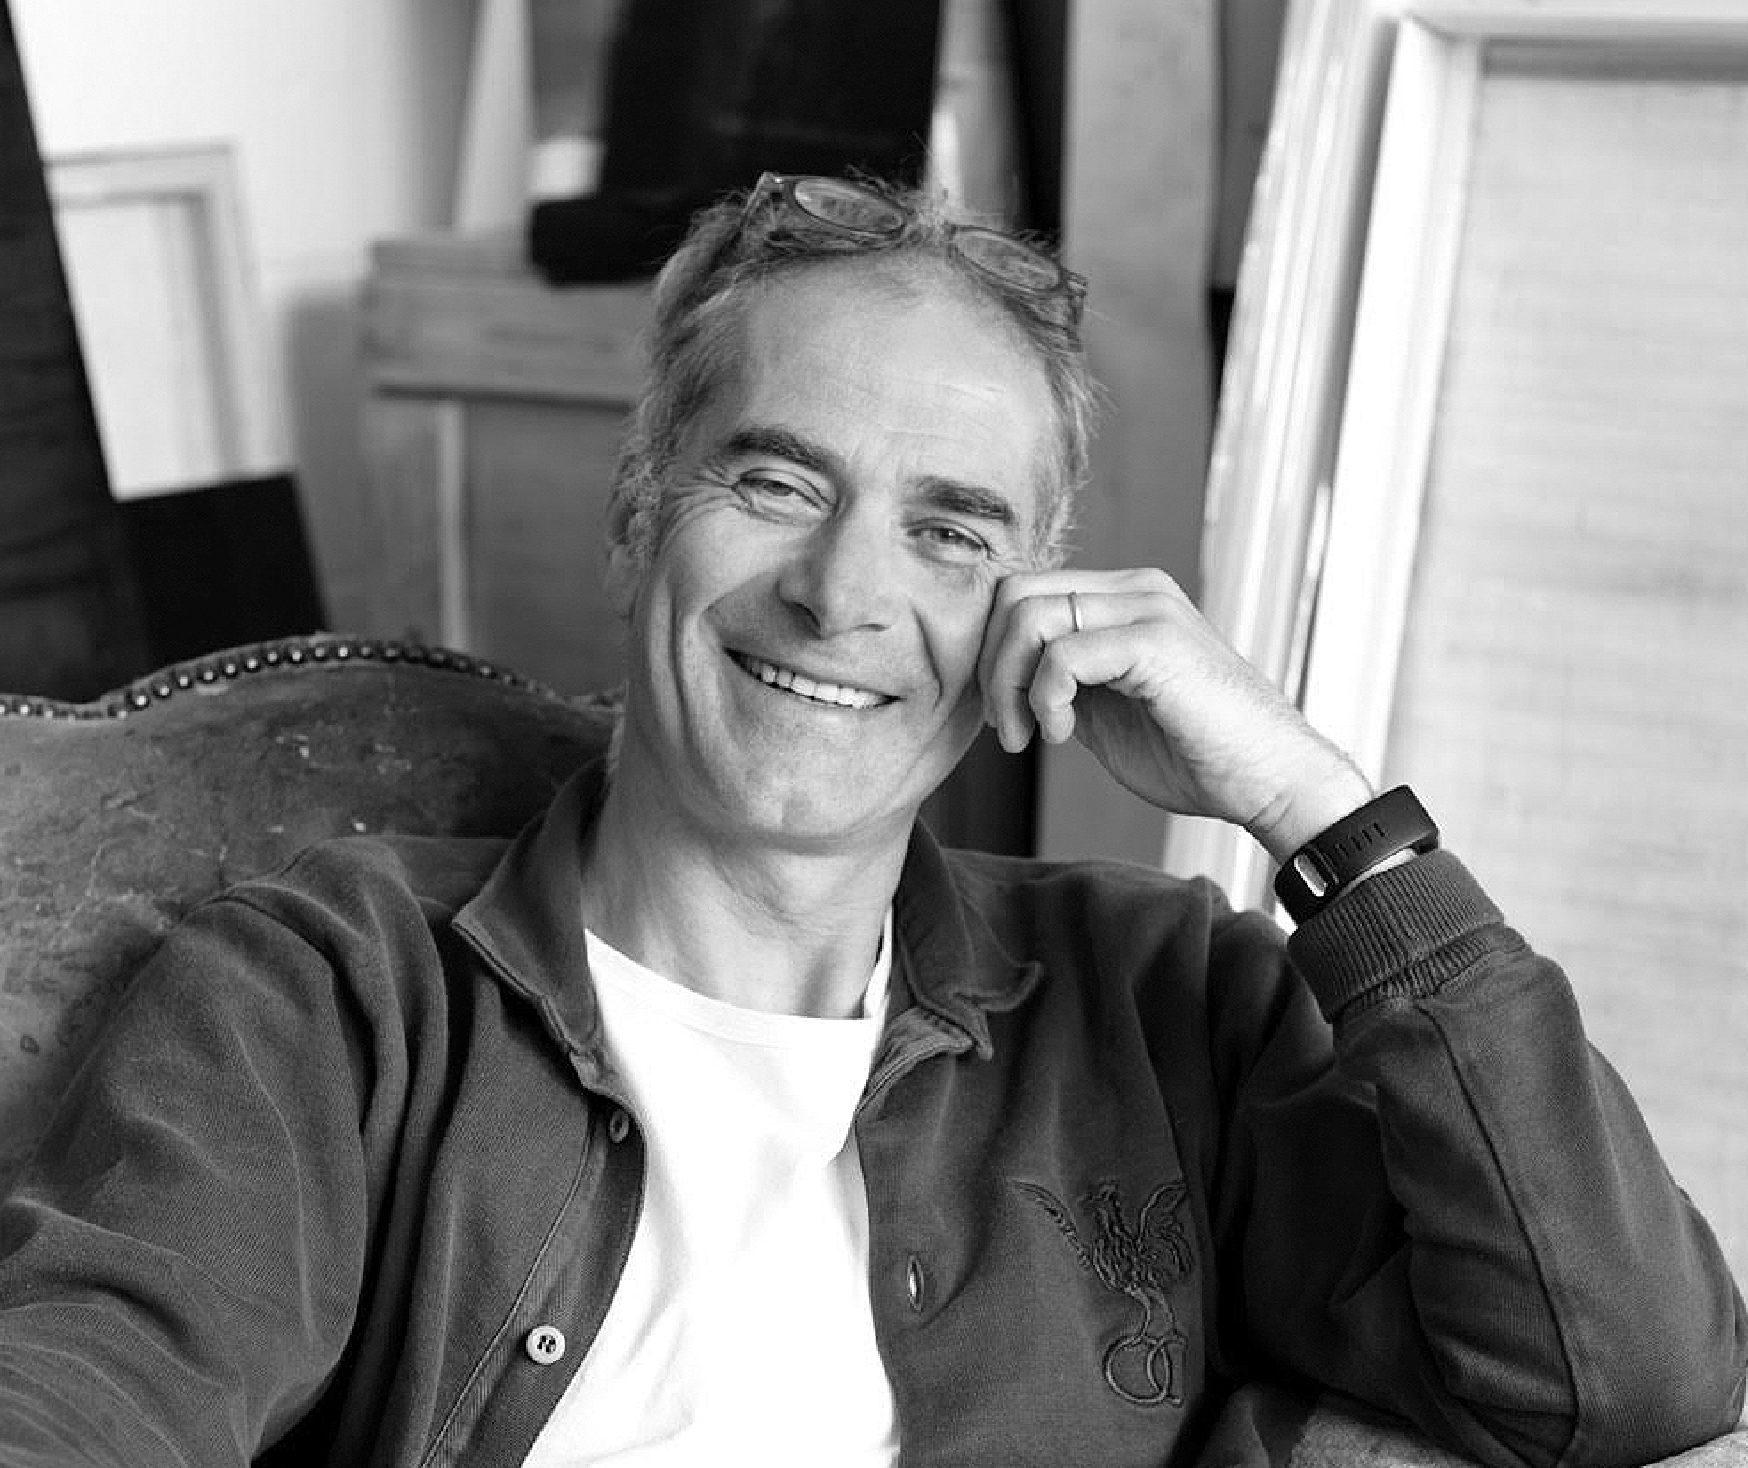 Marc-Antoine Goulard